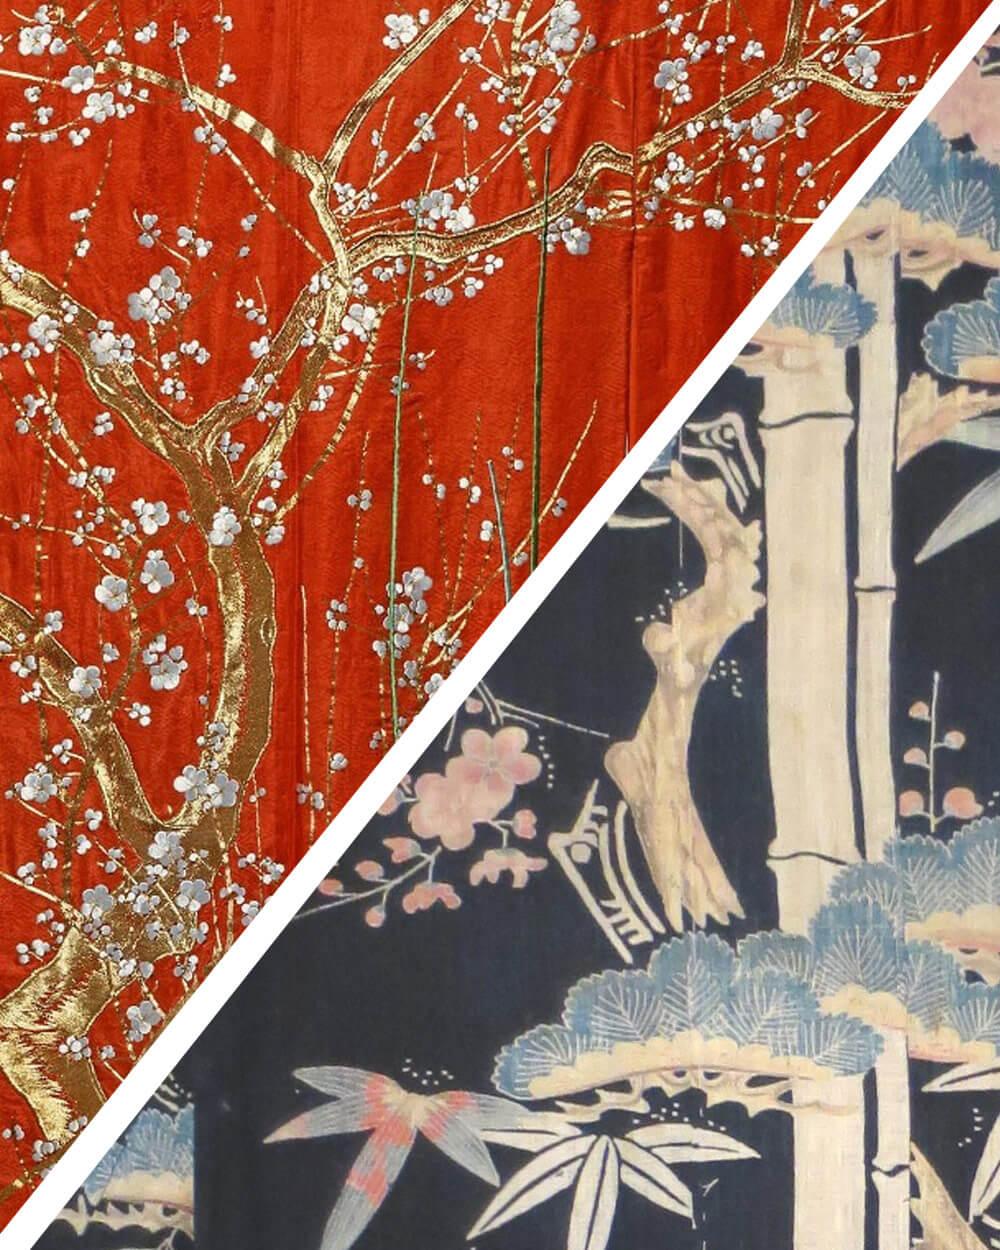 Kimono vs Yukata material differences